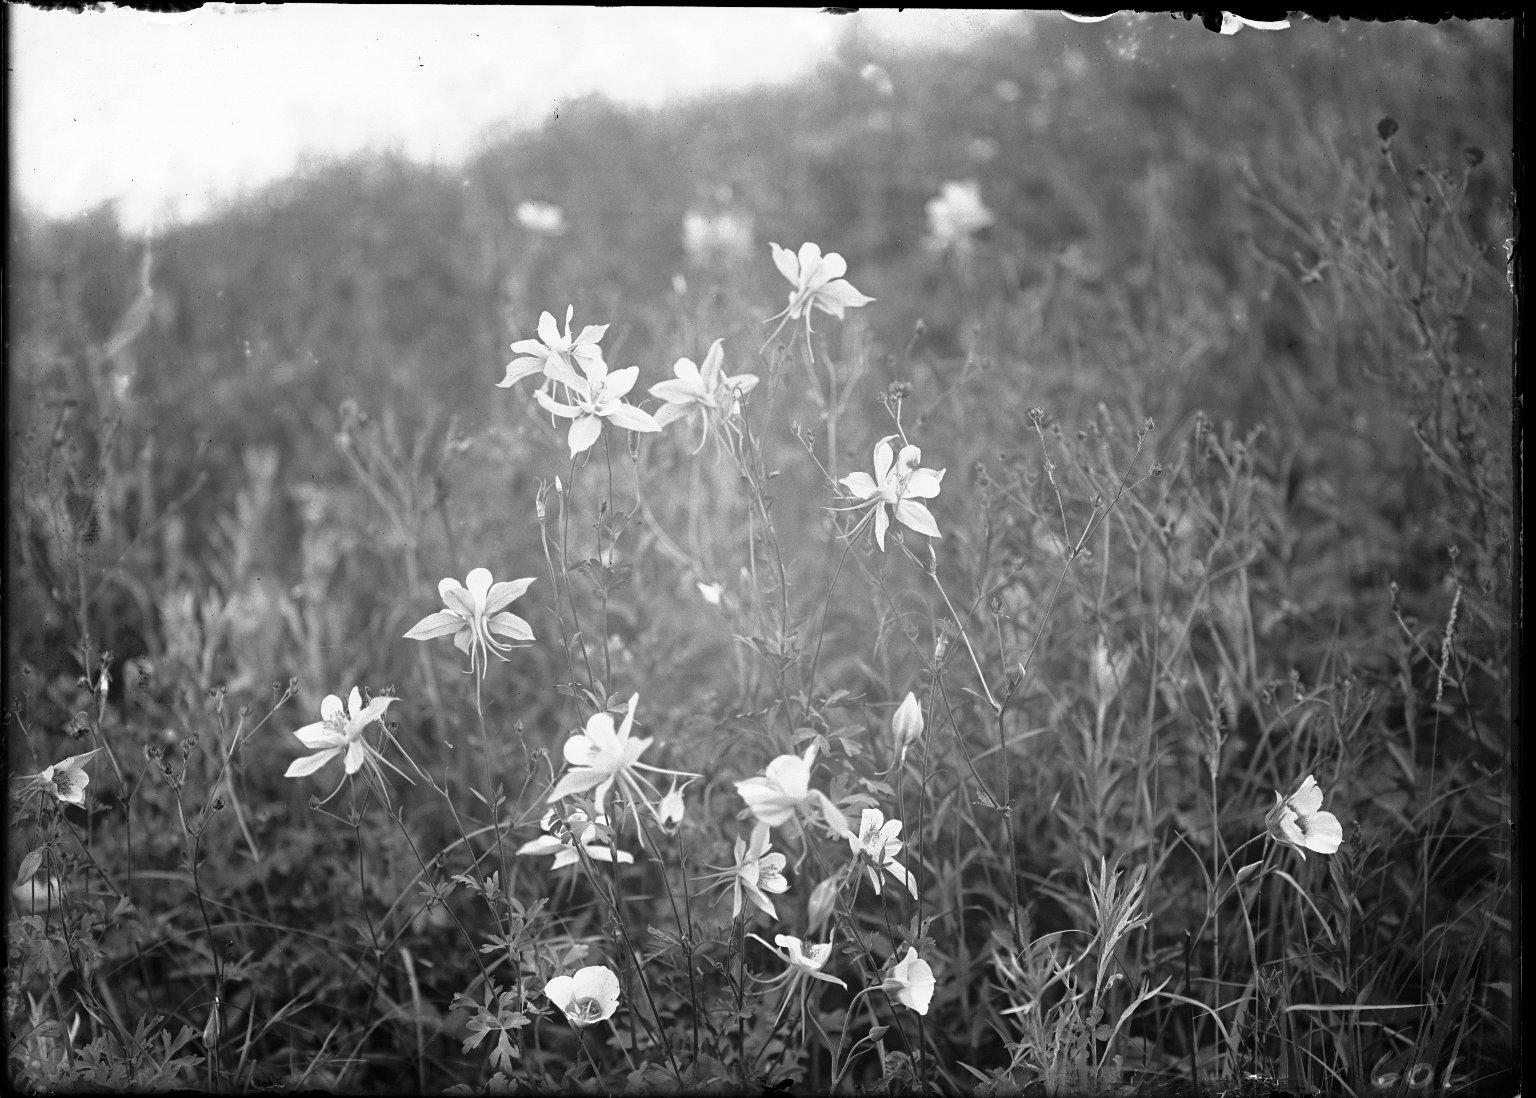 Blue Columbines & Mariposa Lillies